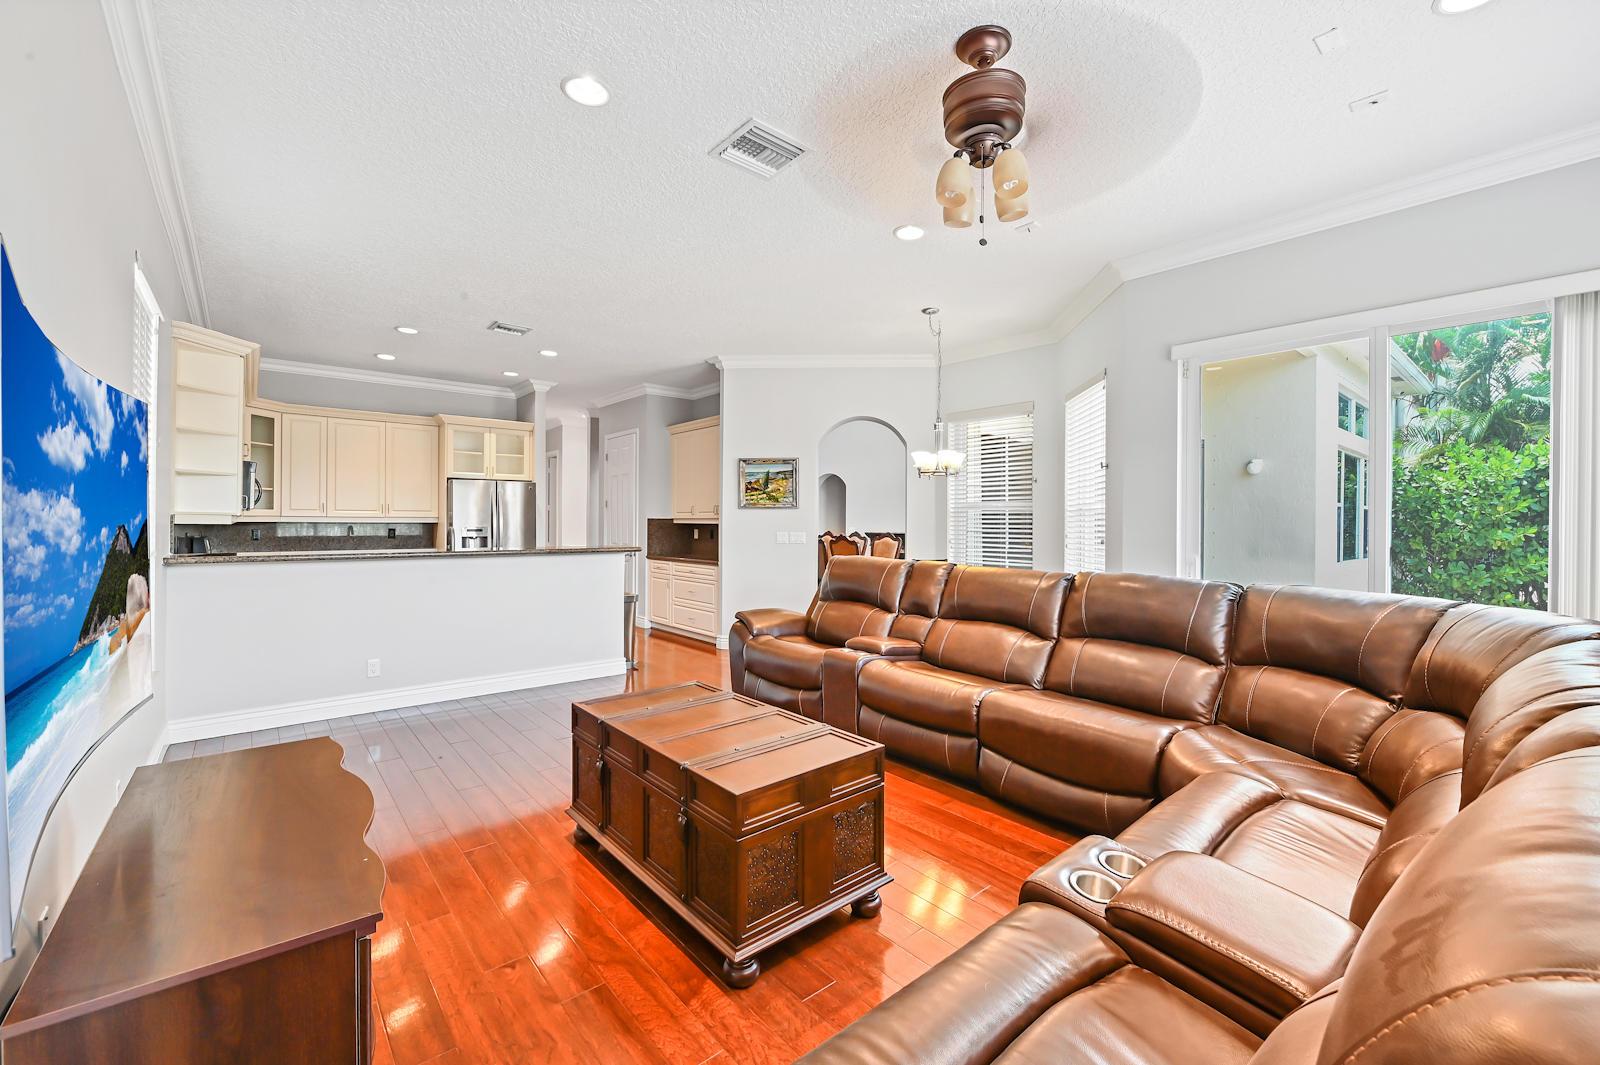 15 Living Room 03